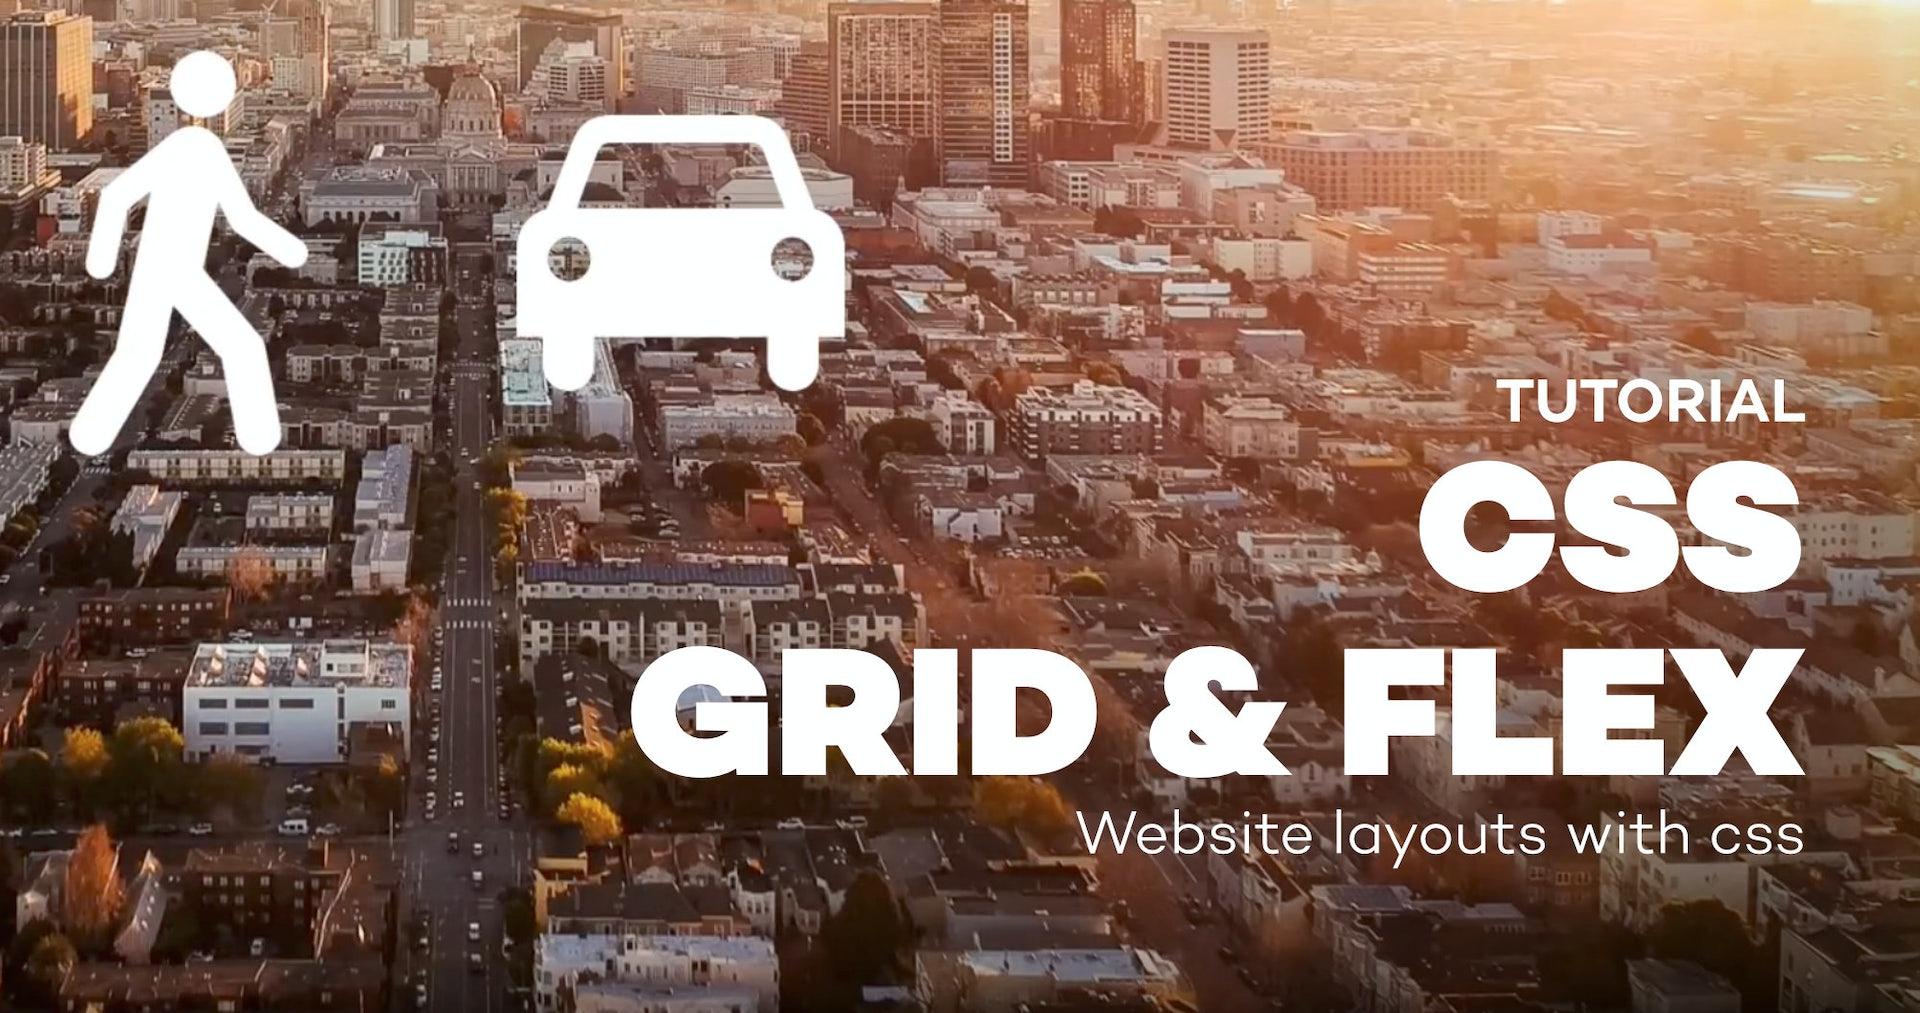 CSS Grid & Flex